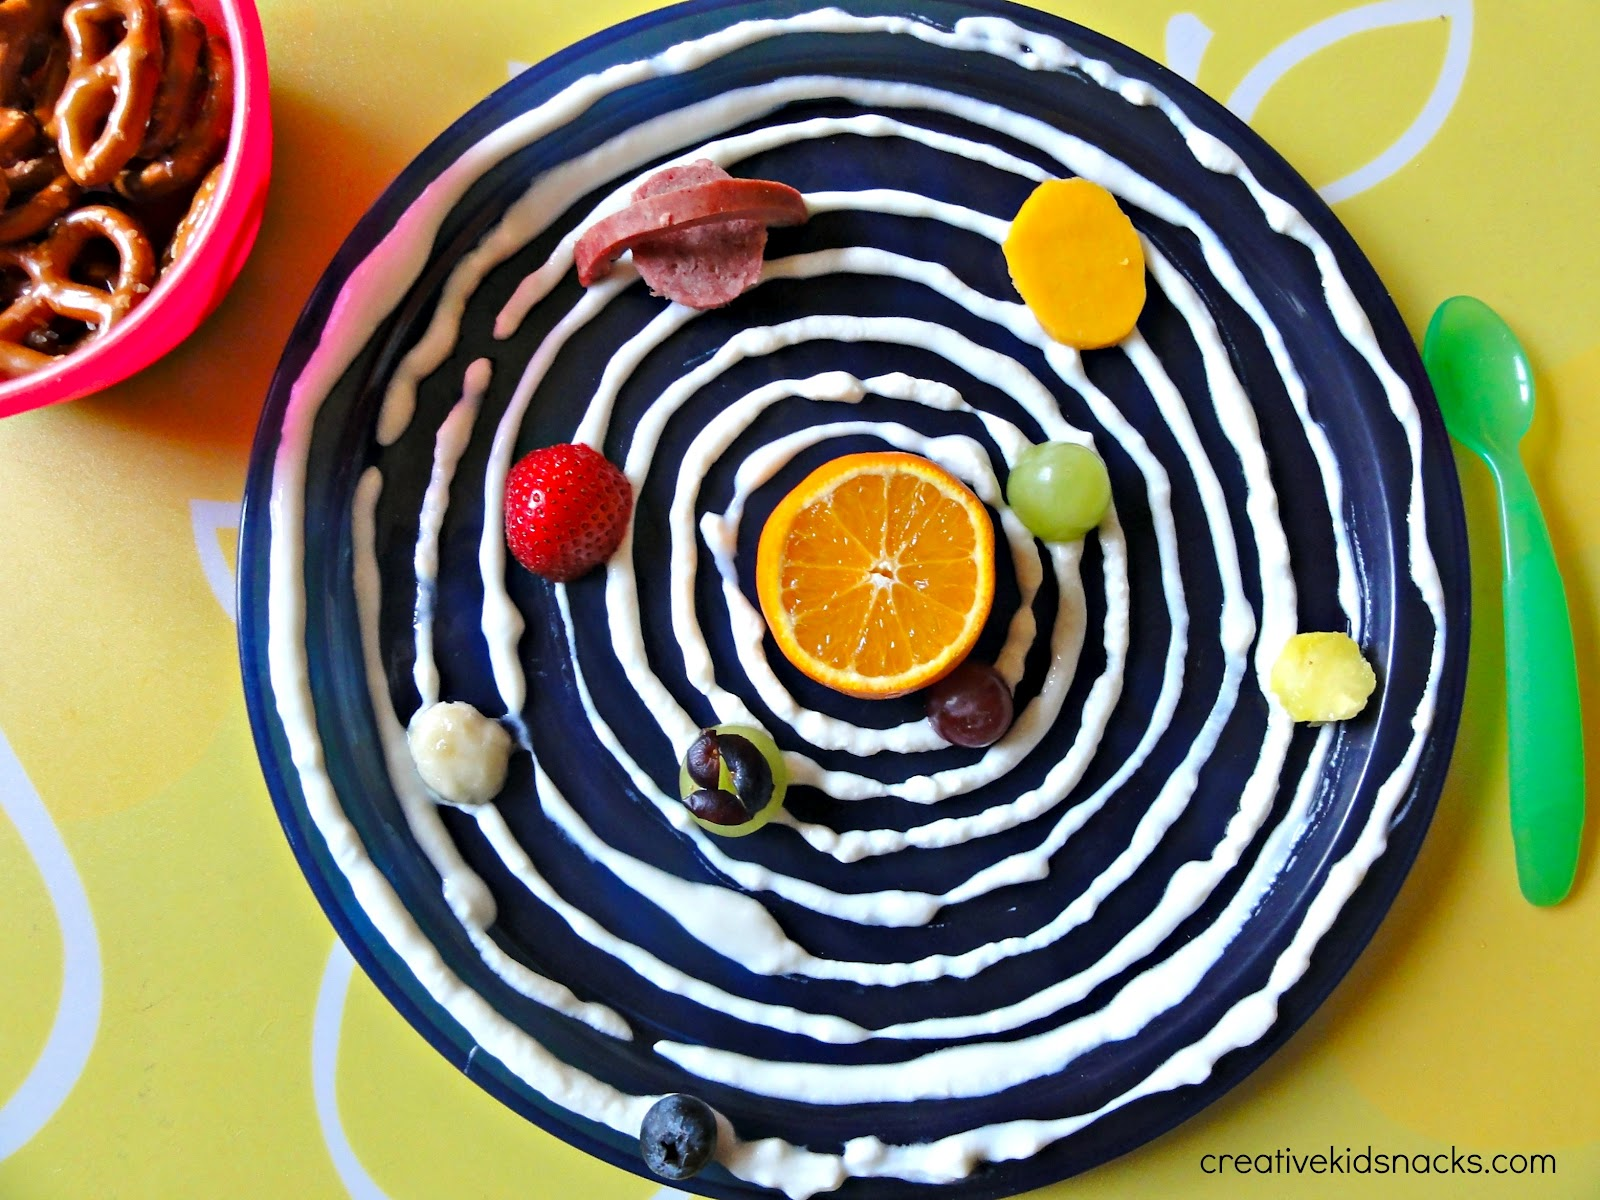 solar system food ideas - photo #21